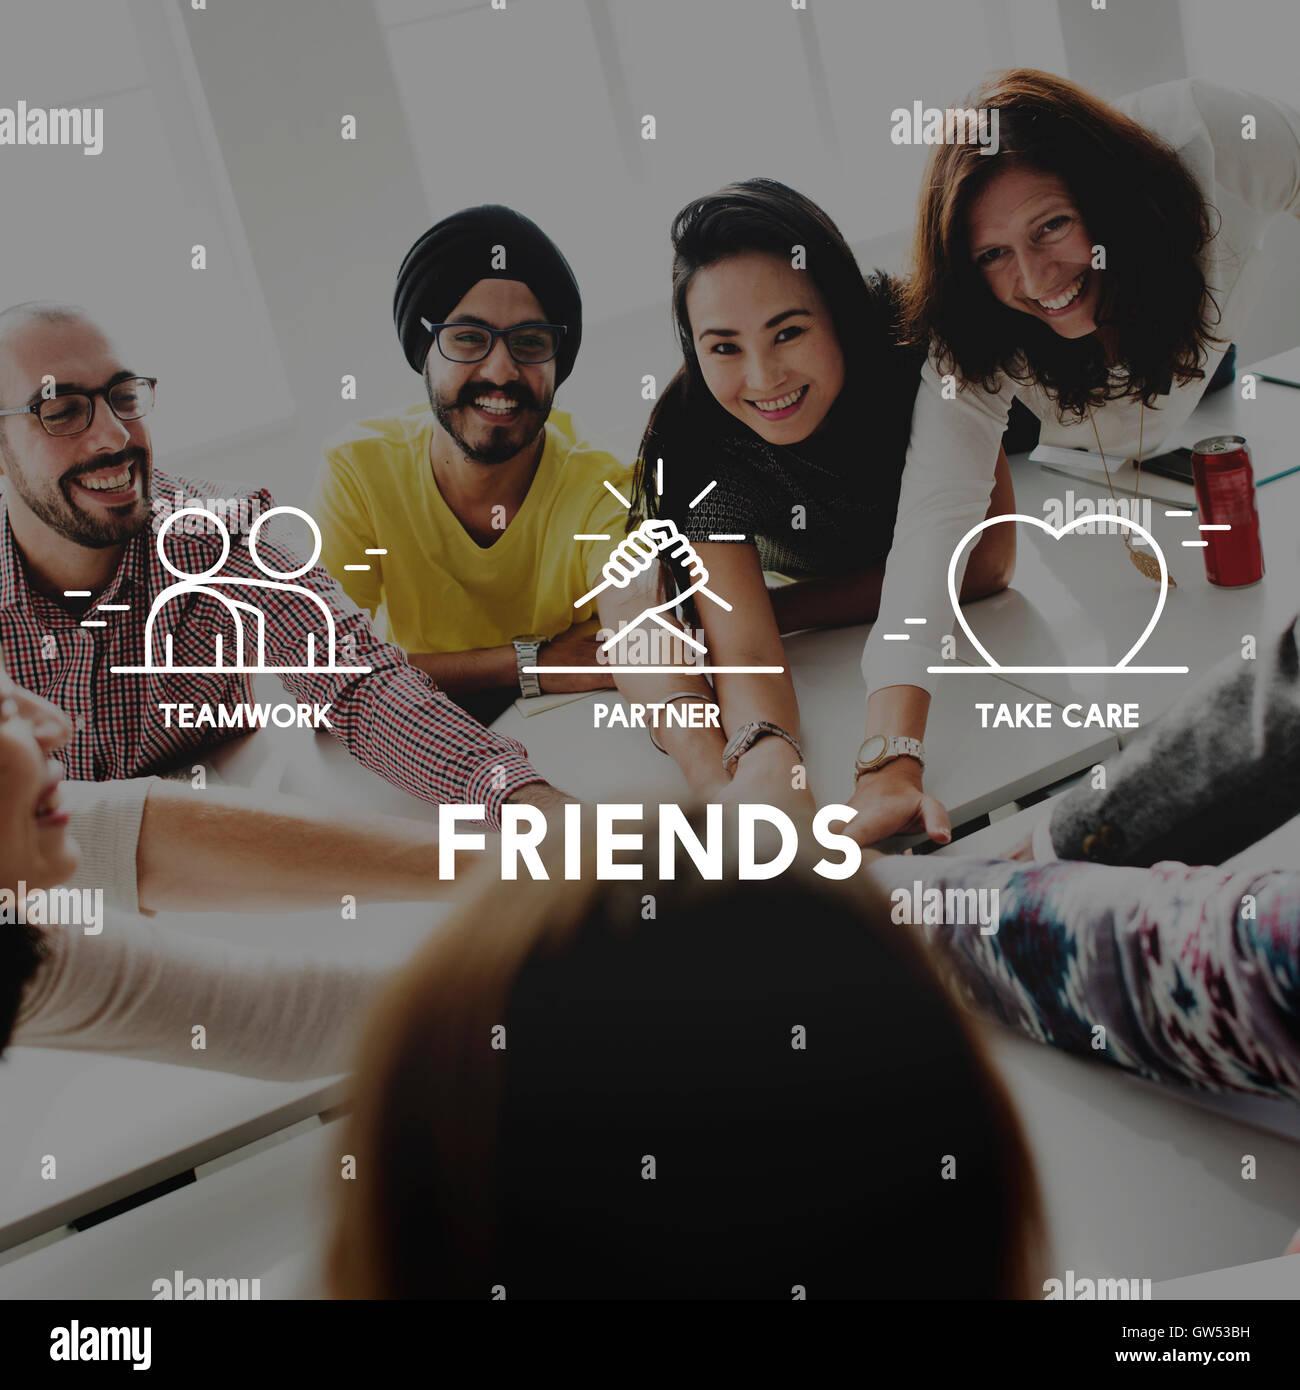 Friends Partner Take Care Teamwork Concept - Stock Image